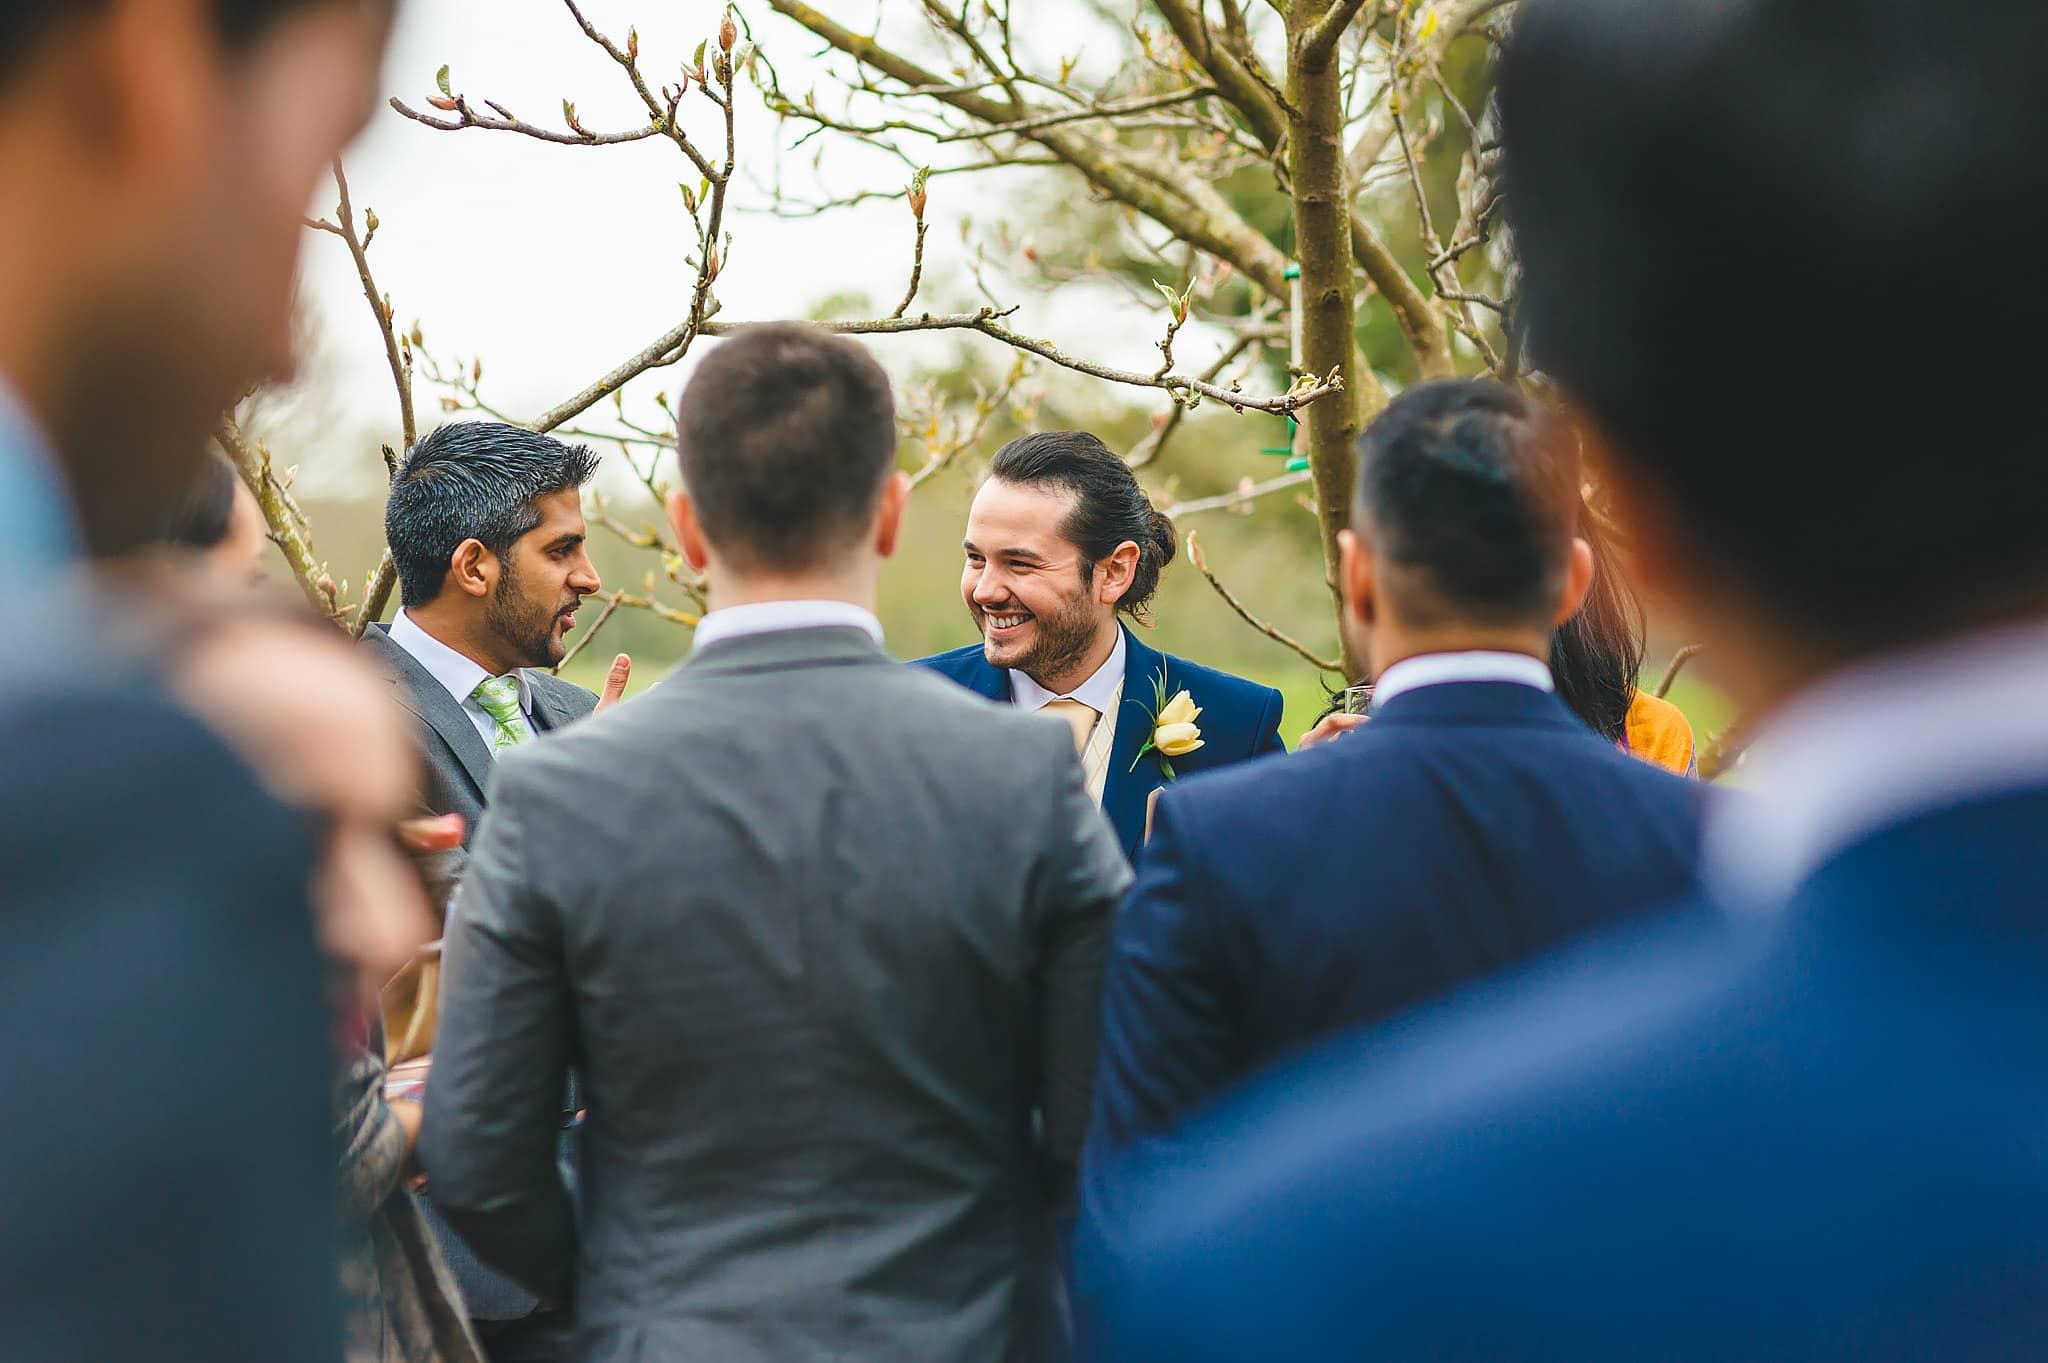 Sheena + Lee | Birtsmorton Court Wedding 7